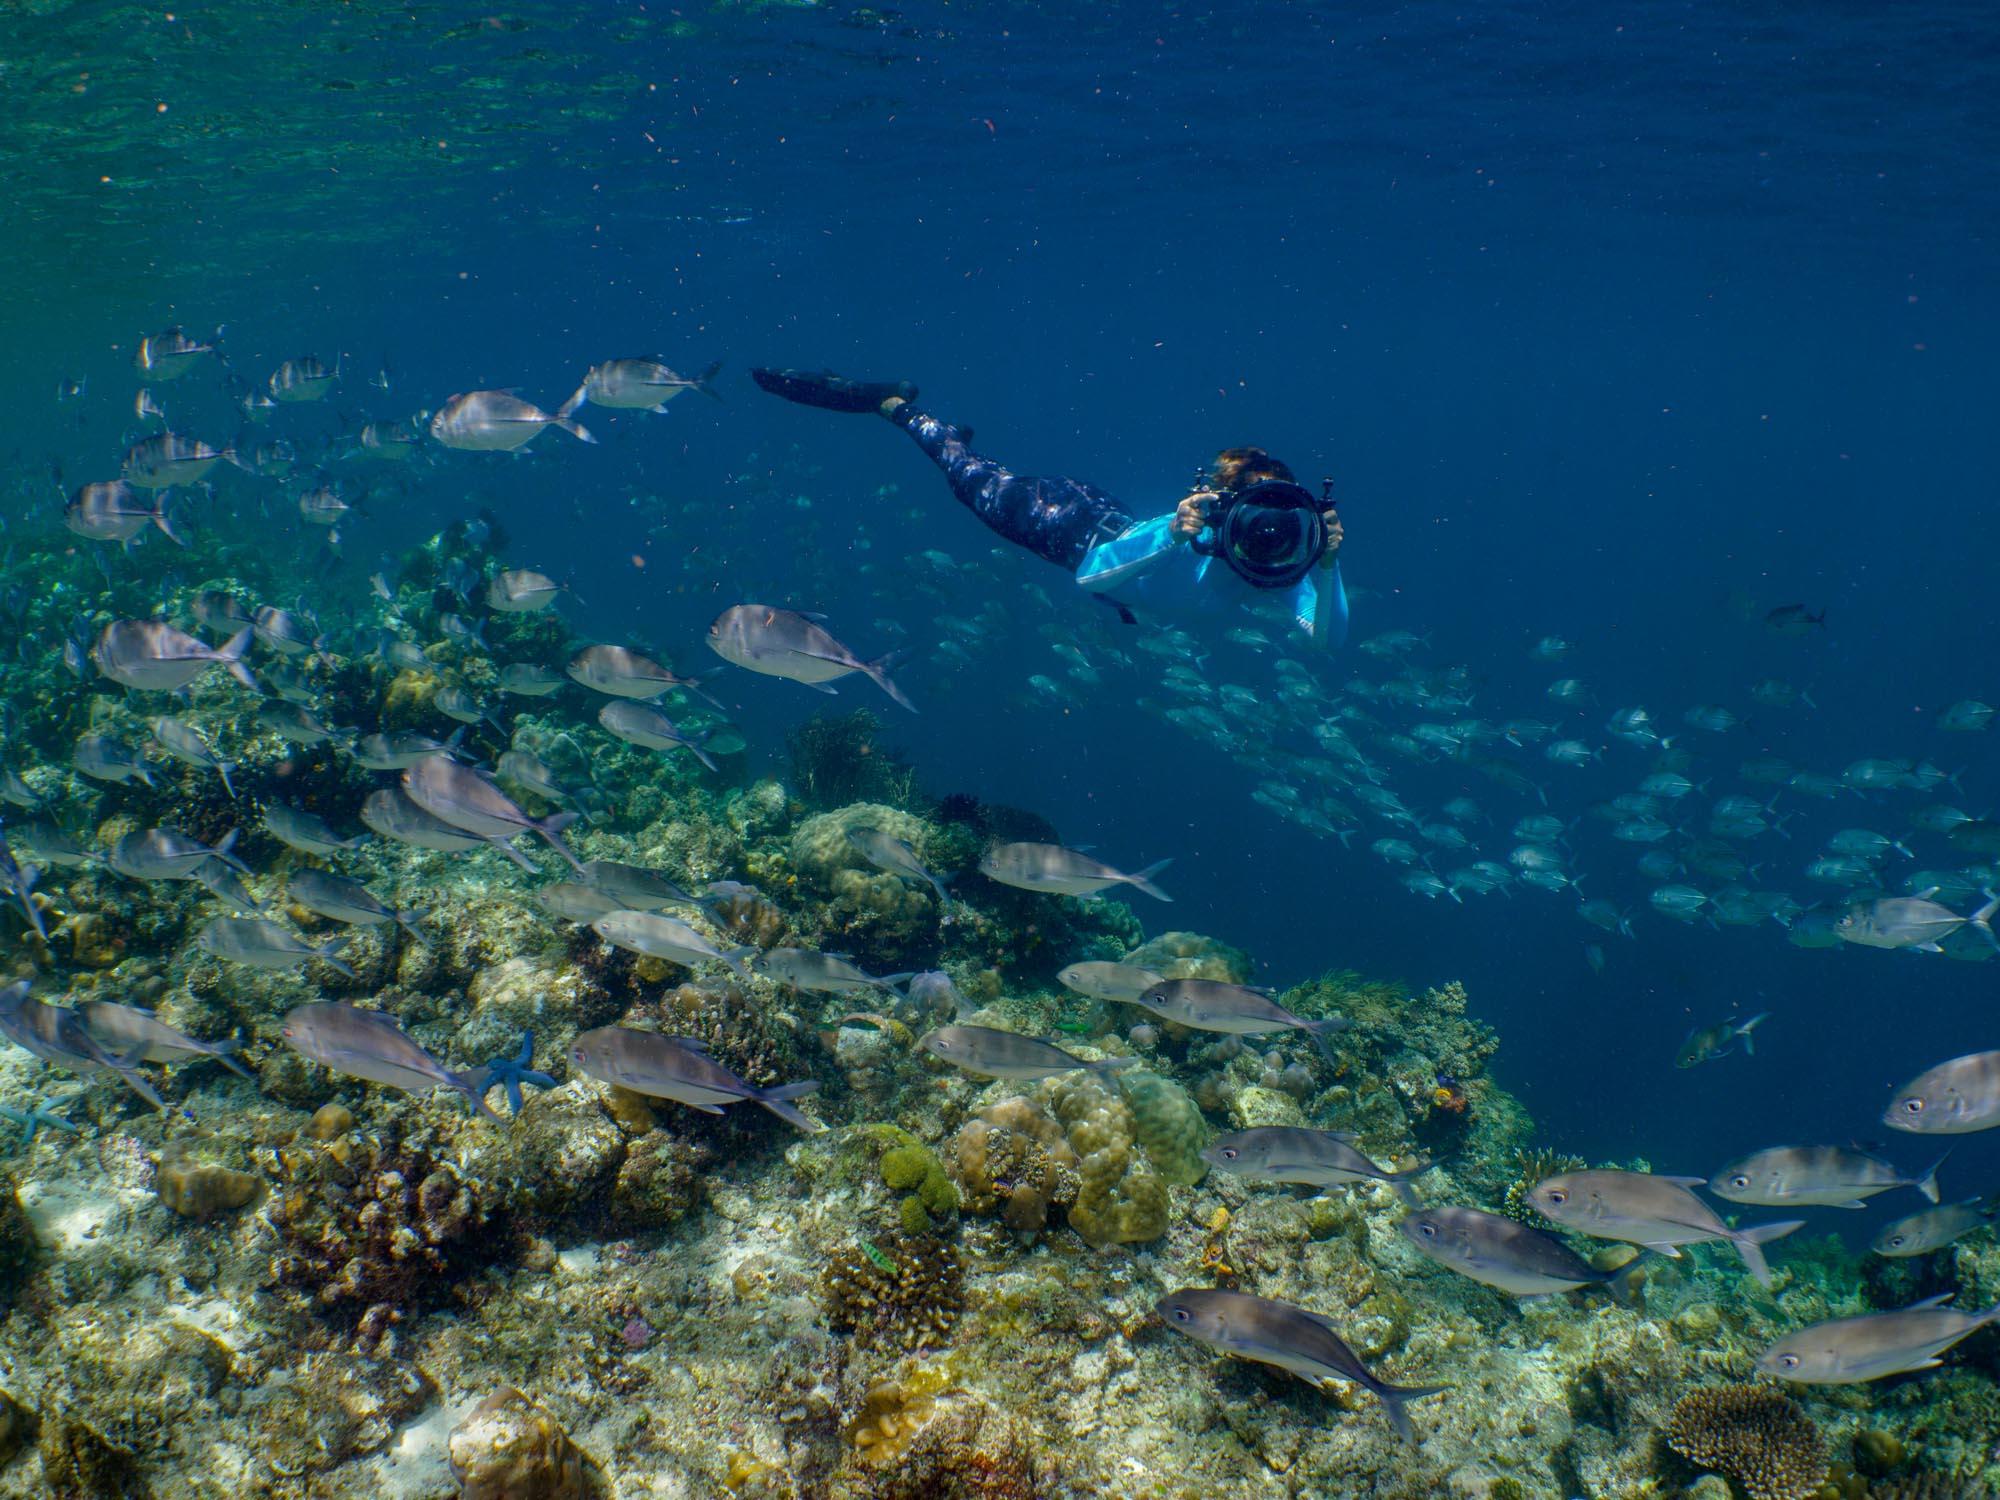 Snorkeler photographing schooling fish